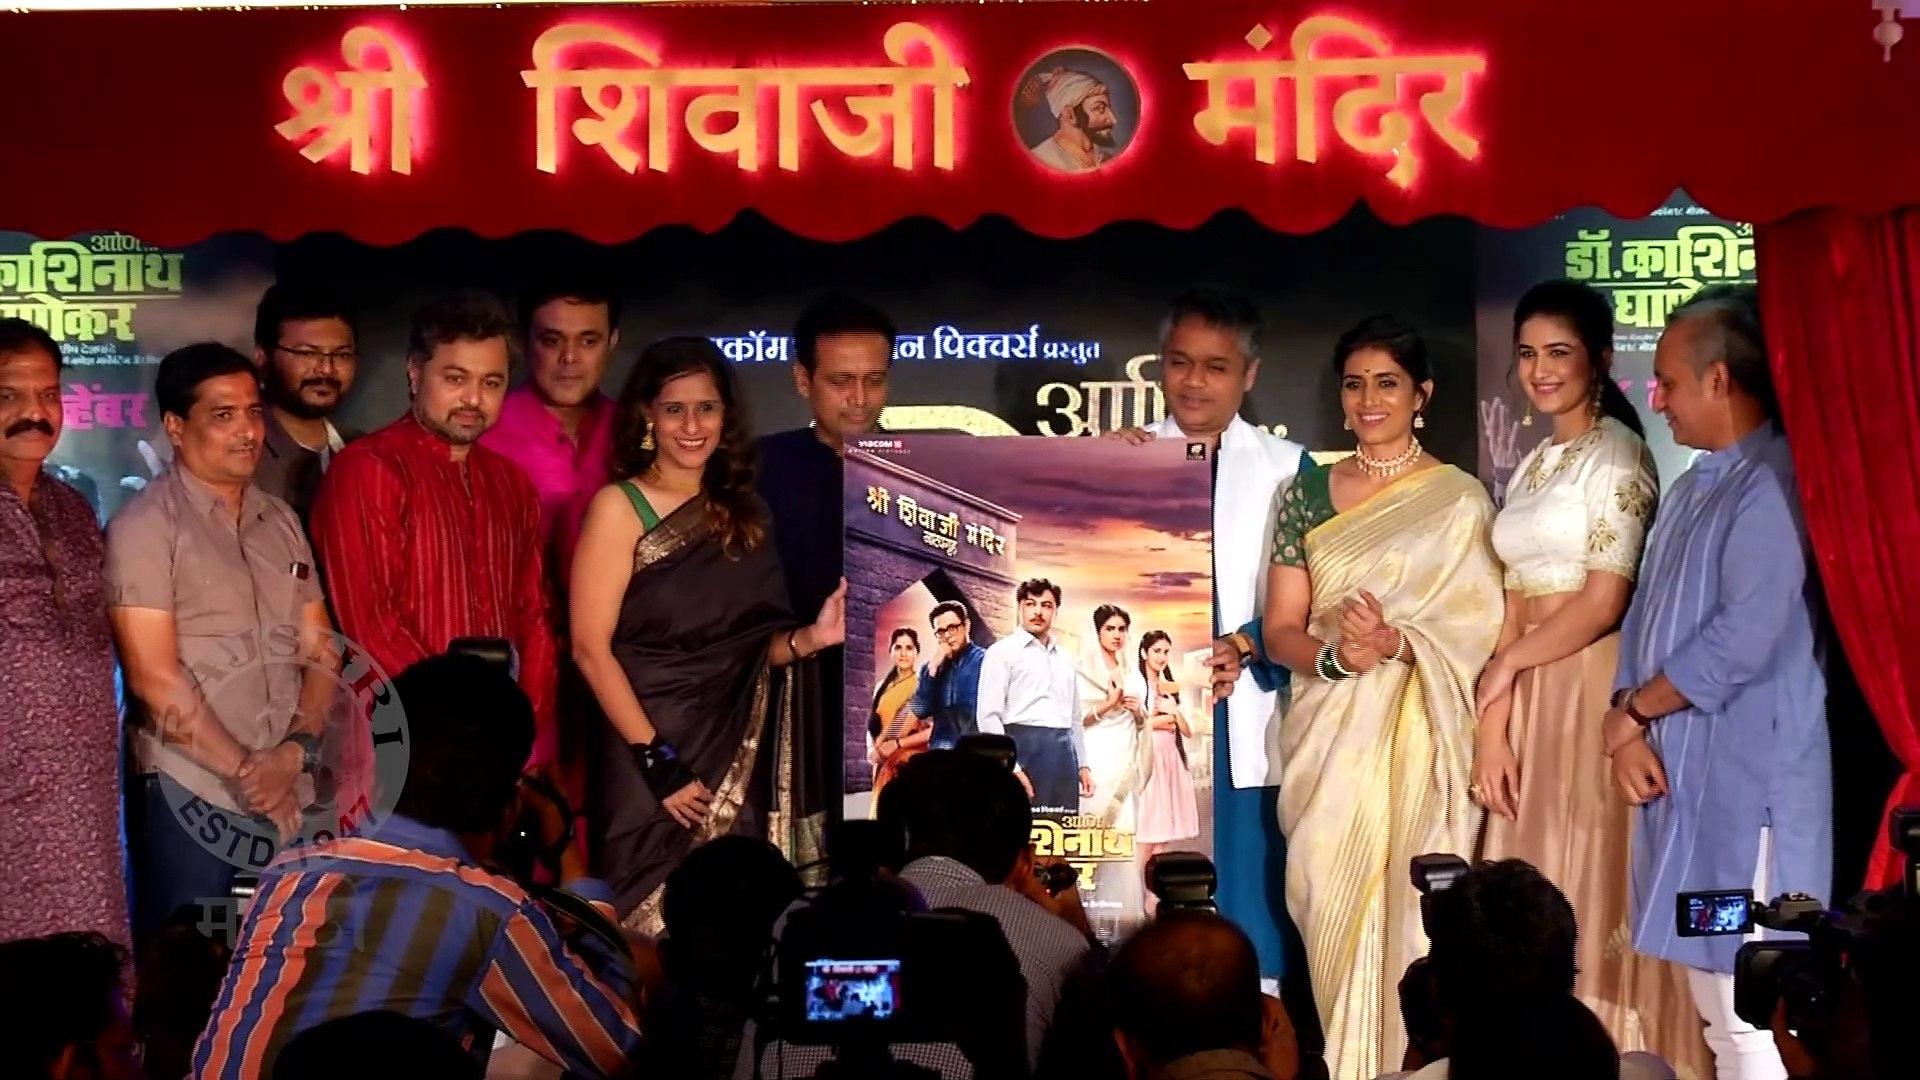 Paavan Khind | Marathi Movie 2020 | बाजीप्रभूंच्या पराक्रमाची गाथा | Abhijeet Deshpande